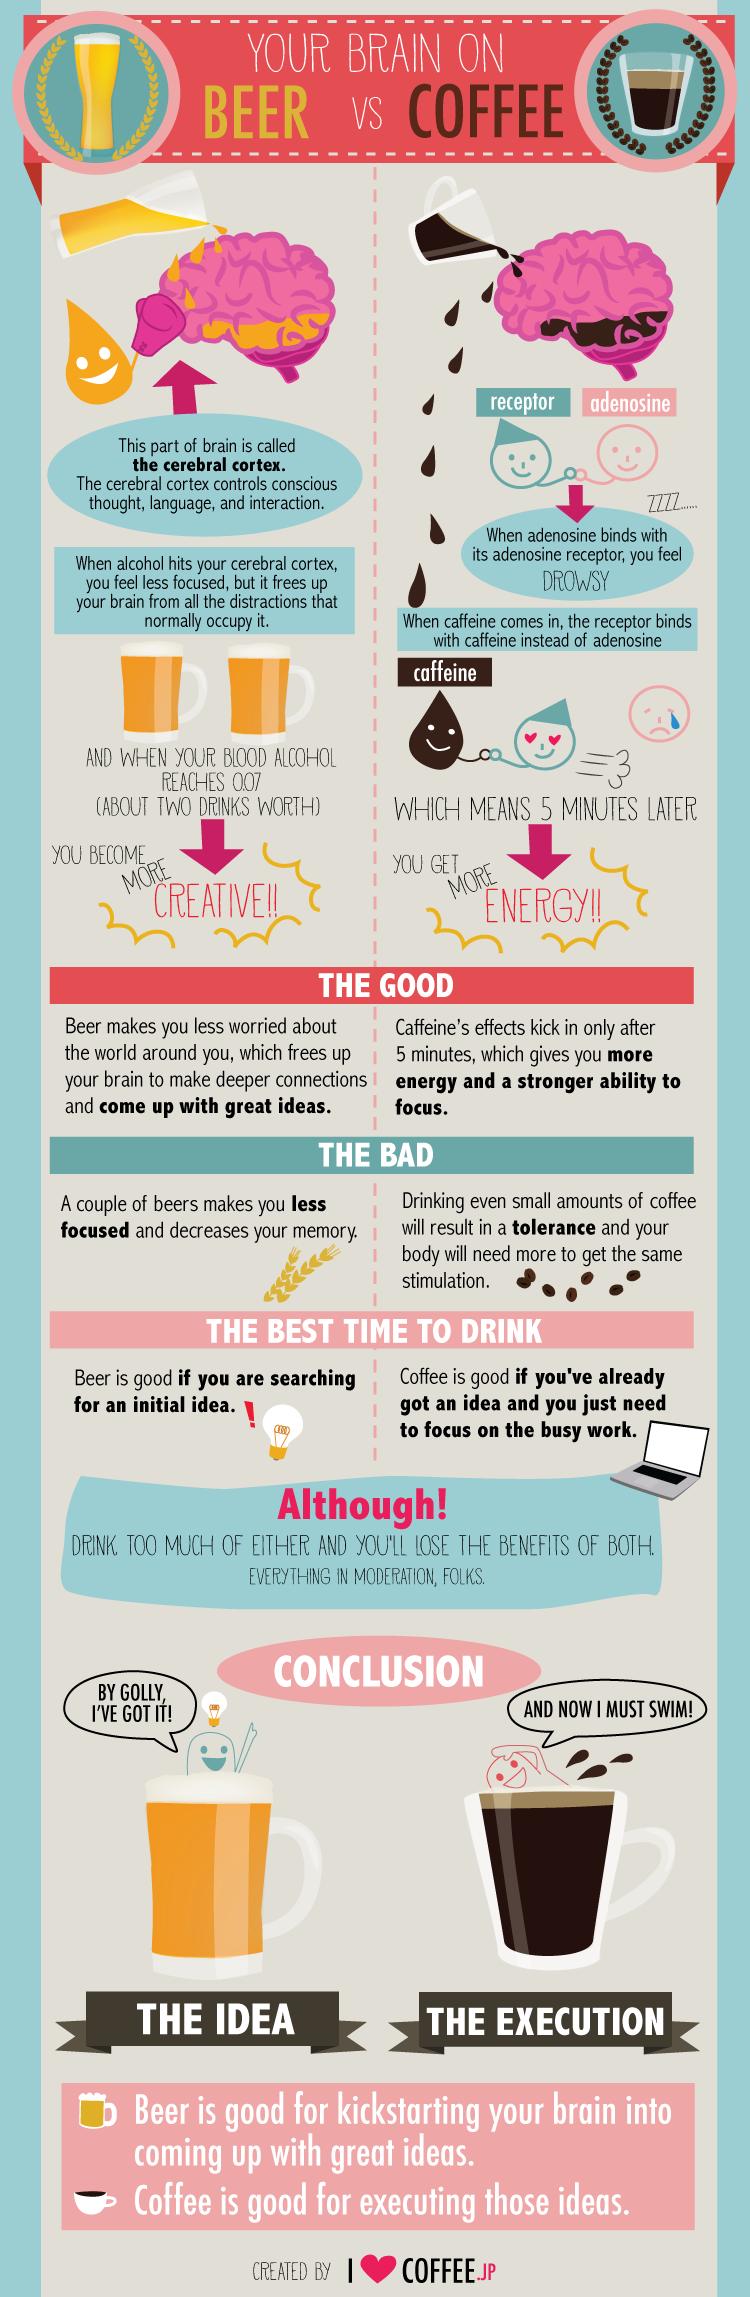 Your brain on coffee versus beer